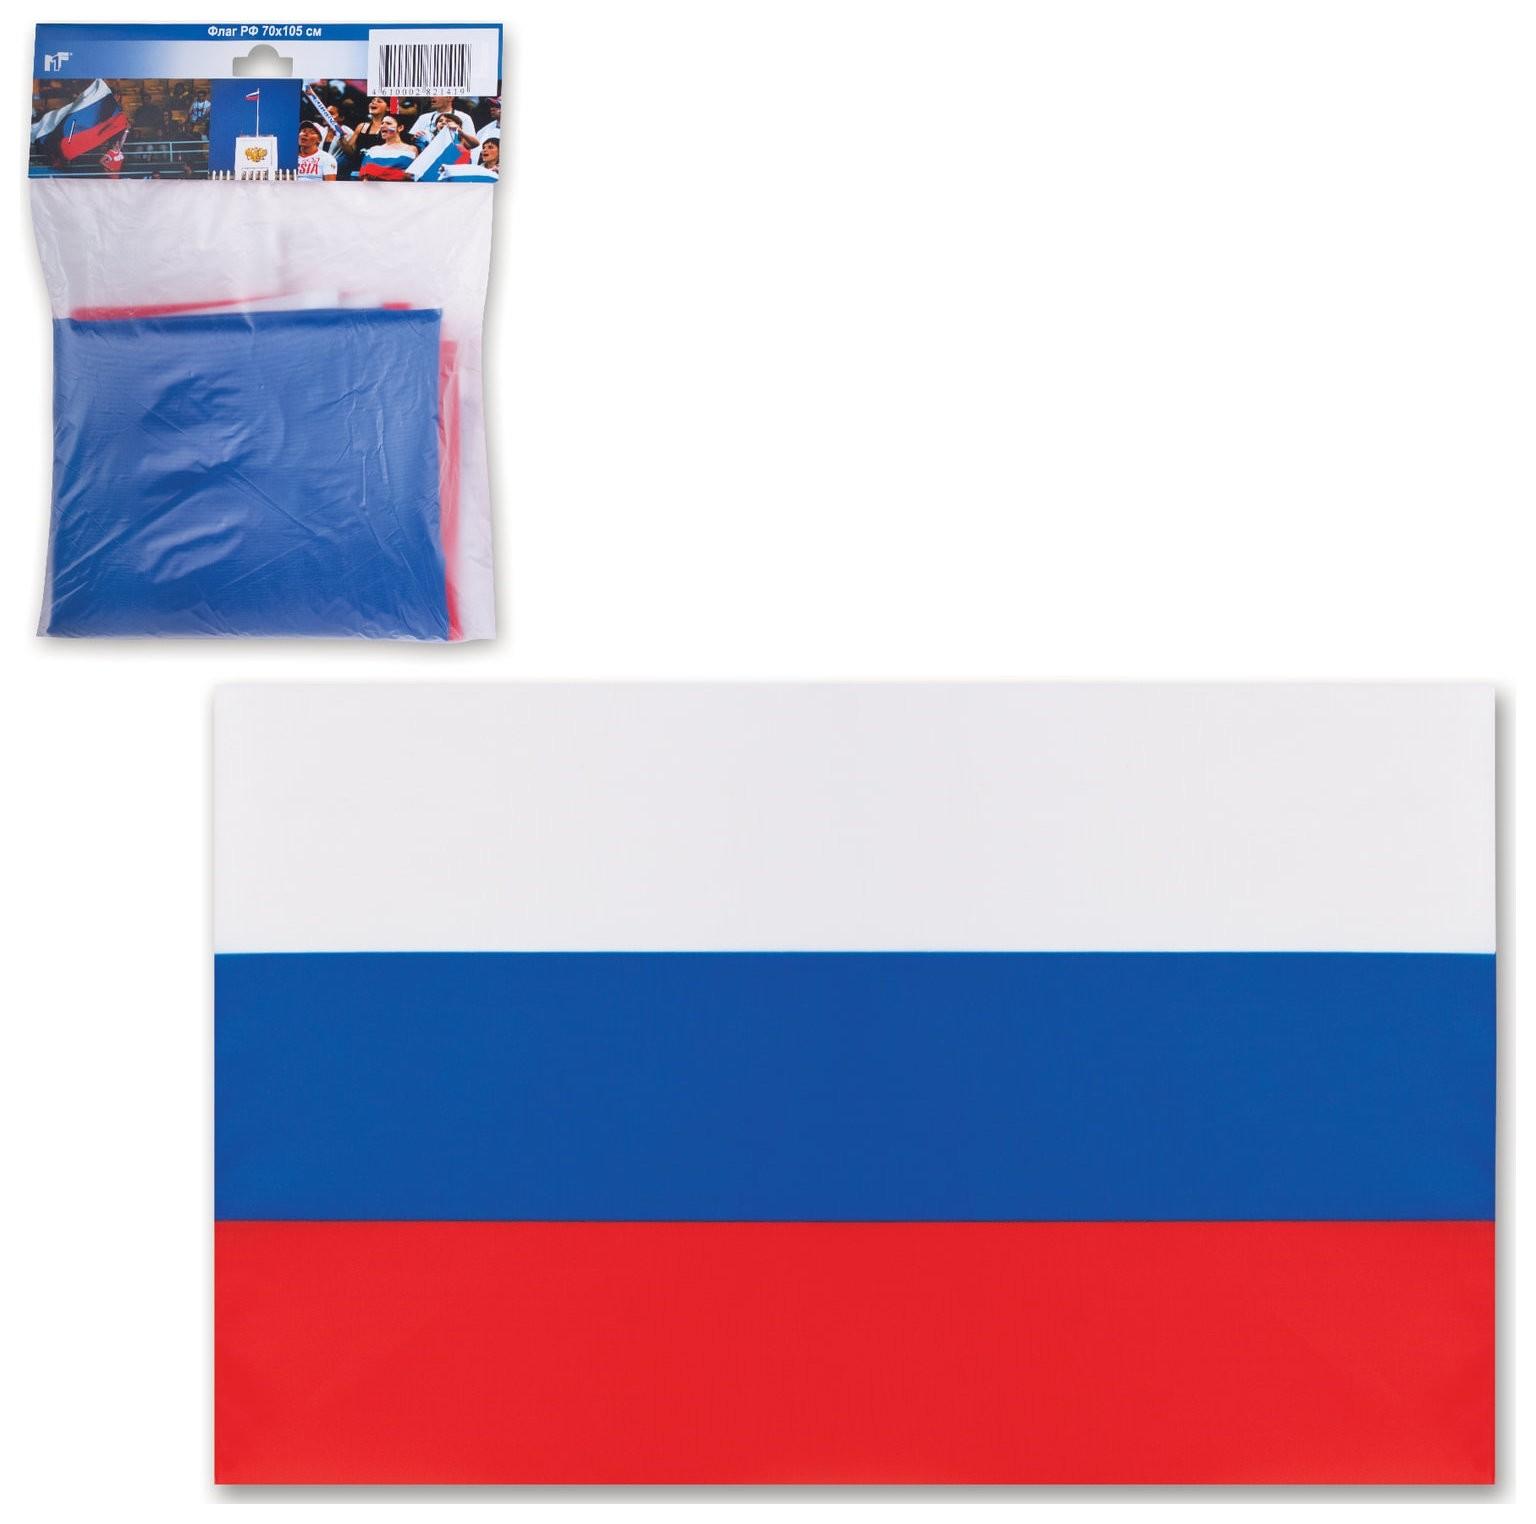 Флаг России, 70х105 см, карман под древко, упаковка с европодвесом  КНР